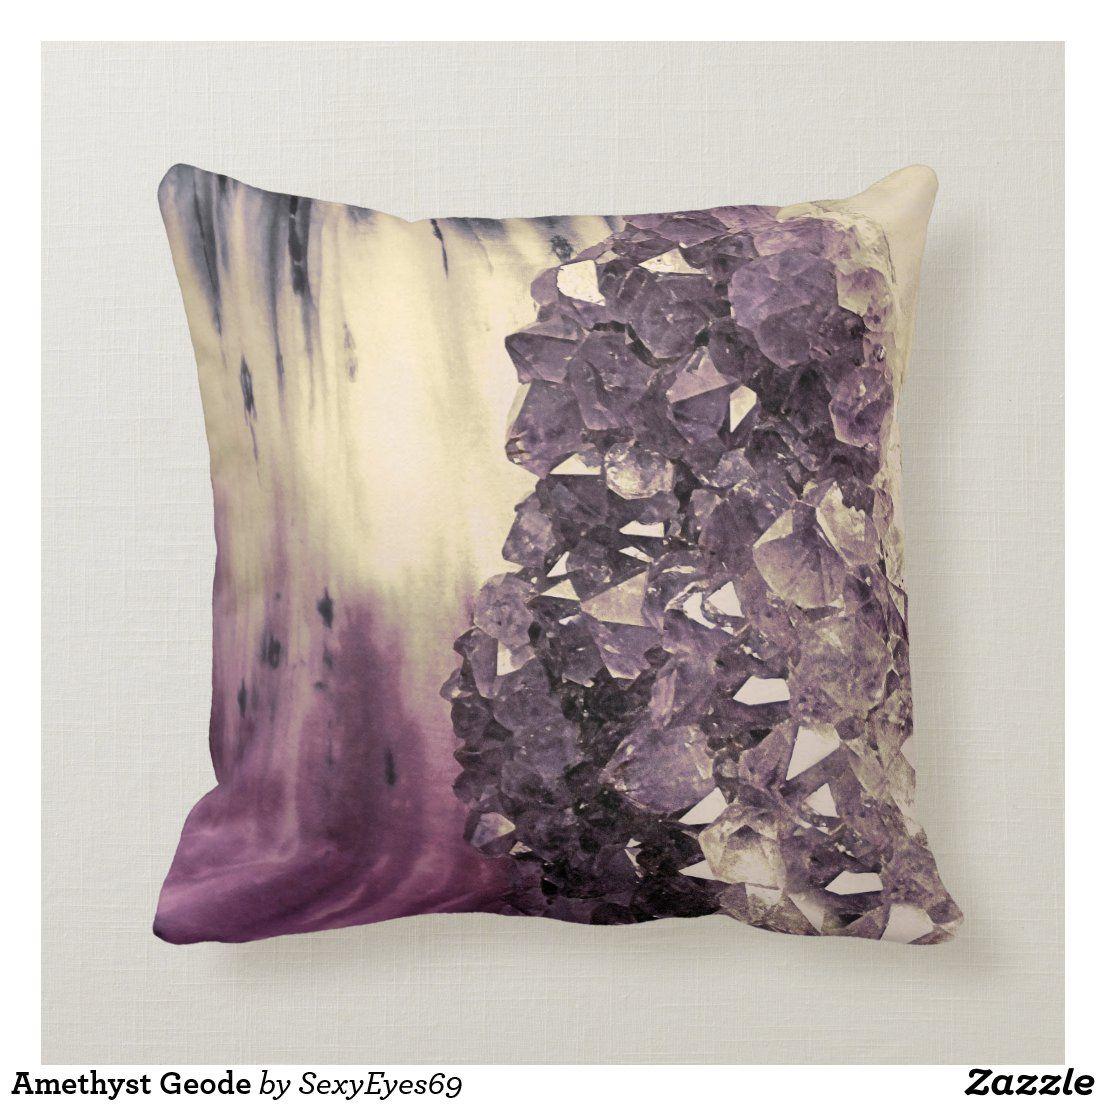 Amethyst Geode Throw Pillow Zazzle Com Throw Pillows Amethyst Geode Pillows